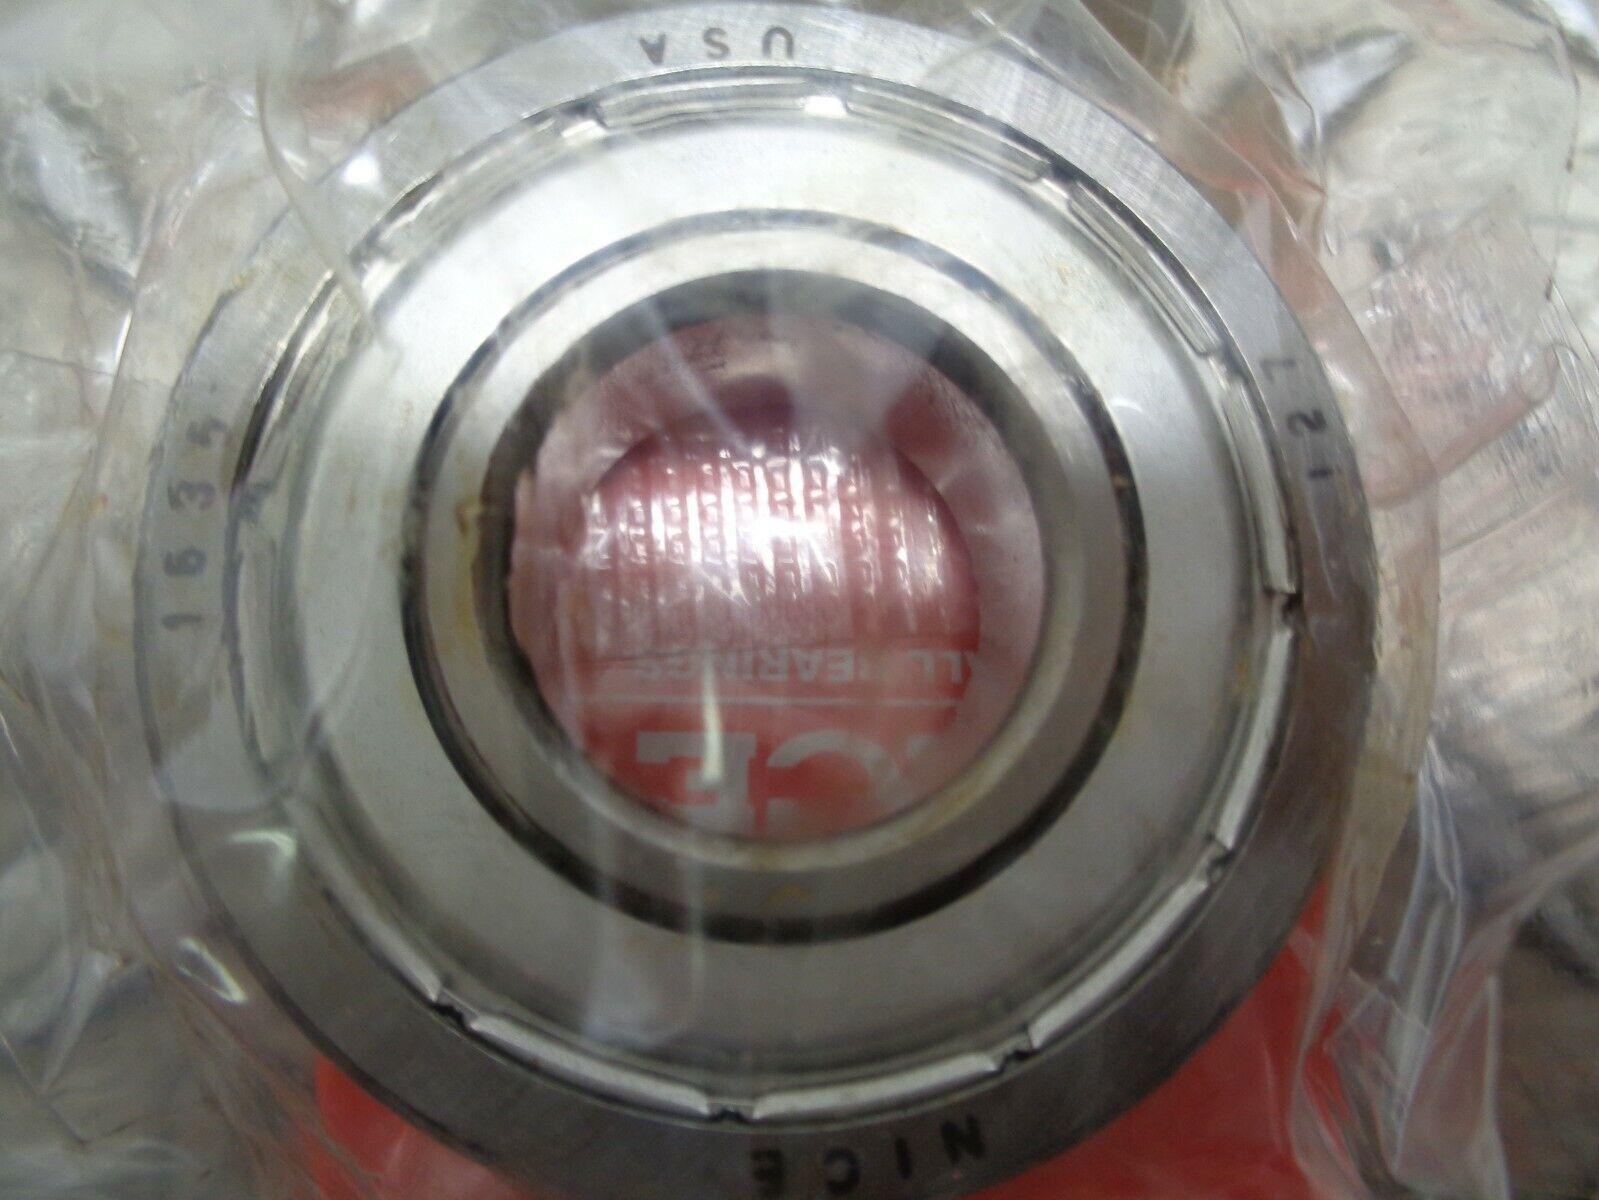 Lot of 10 Nice Ball Bearings RBC Bearings Radial//Deep Groove 3020DCTN NEW